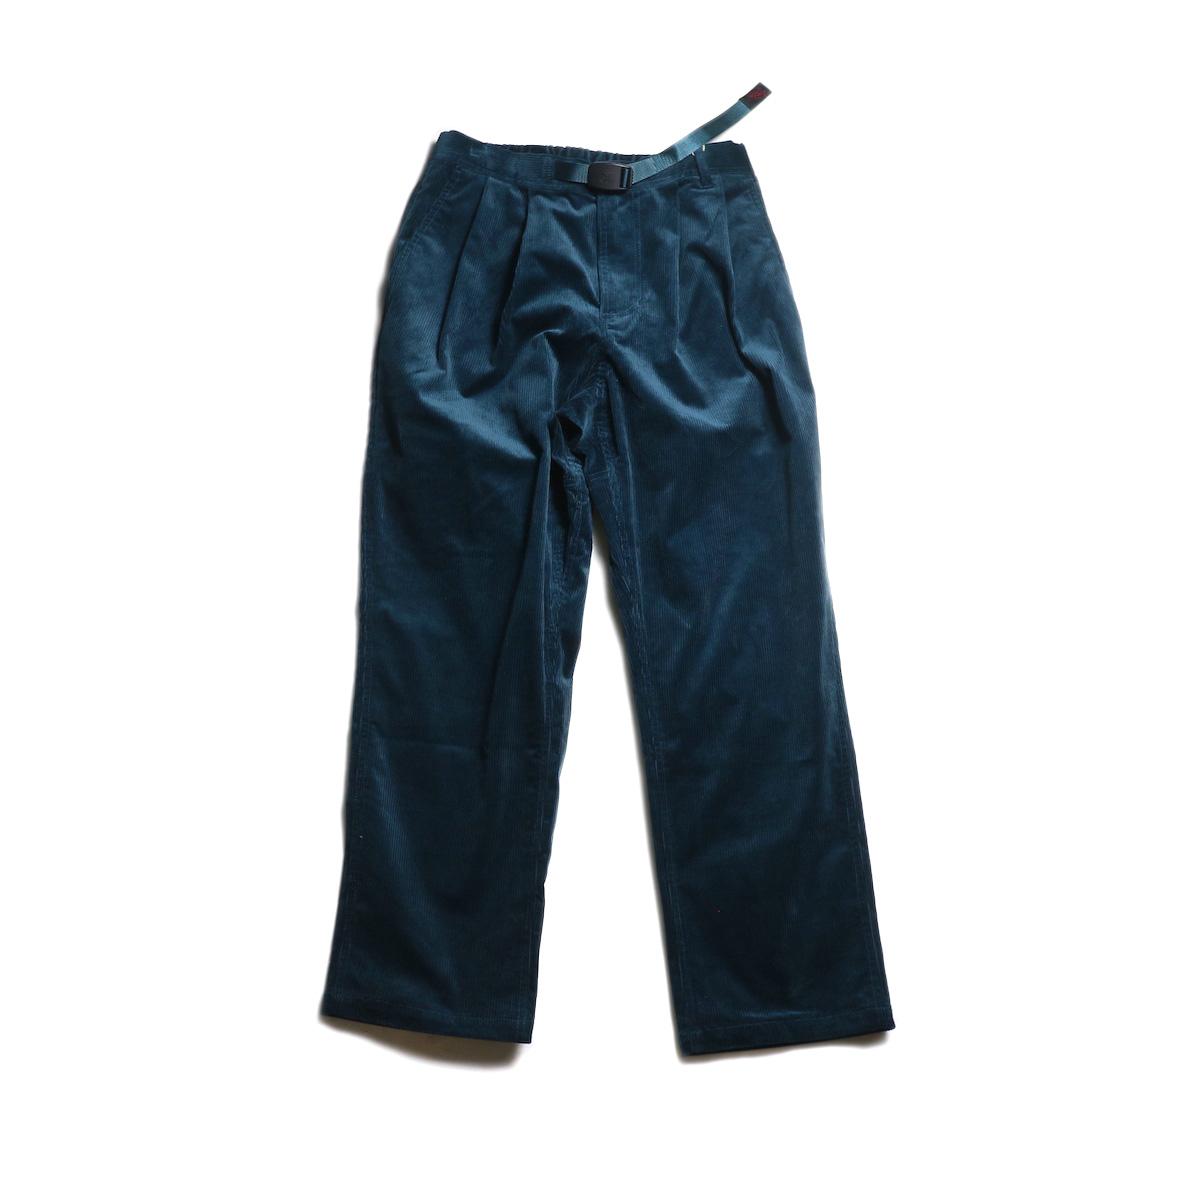 GRAMICCI (Ladie's) / CORDUROY GURKHA PANTS (Deep Blue)